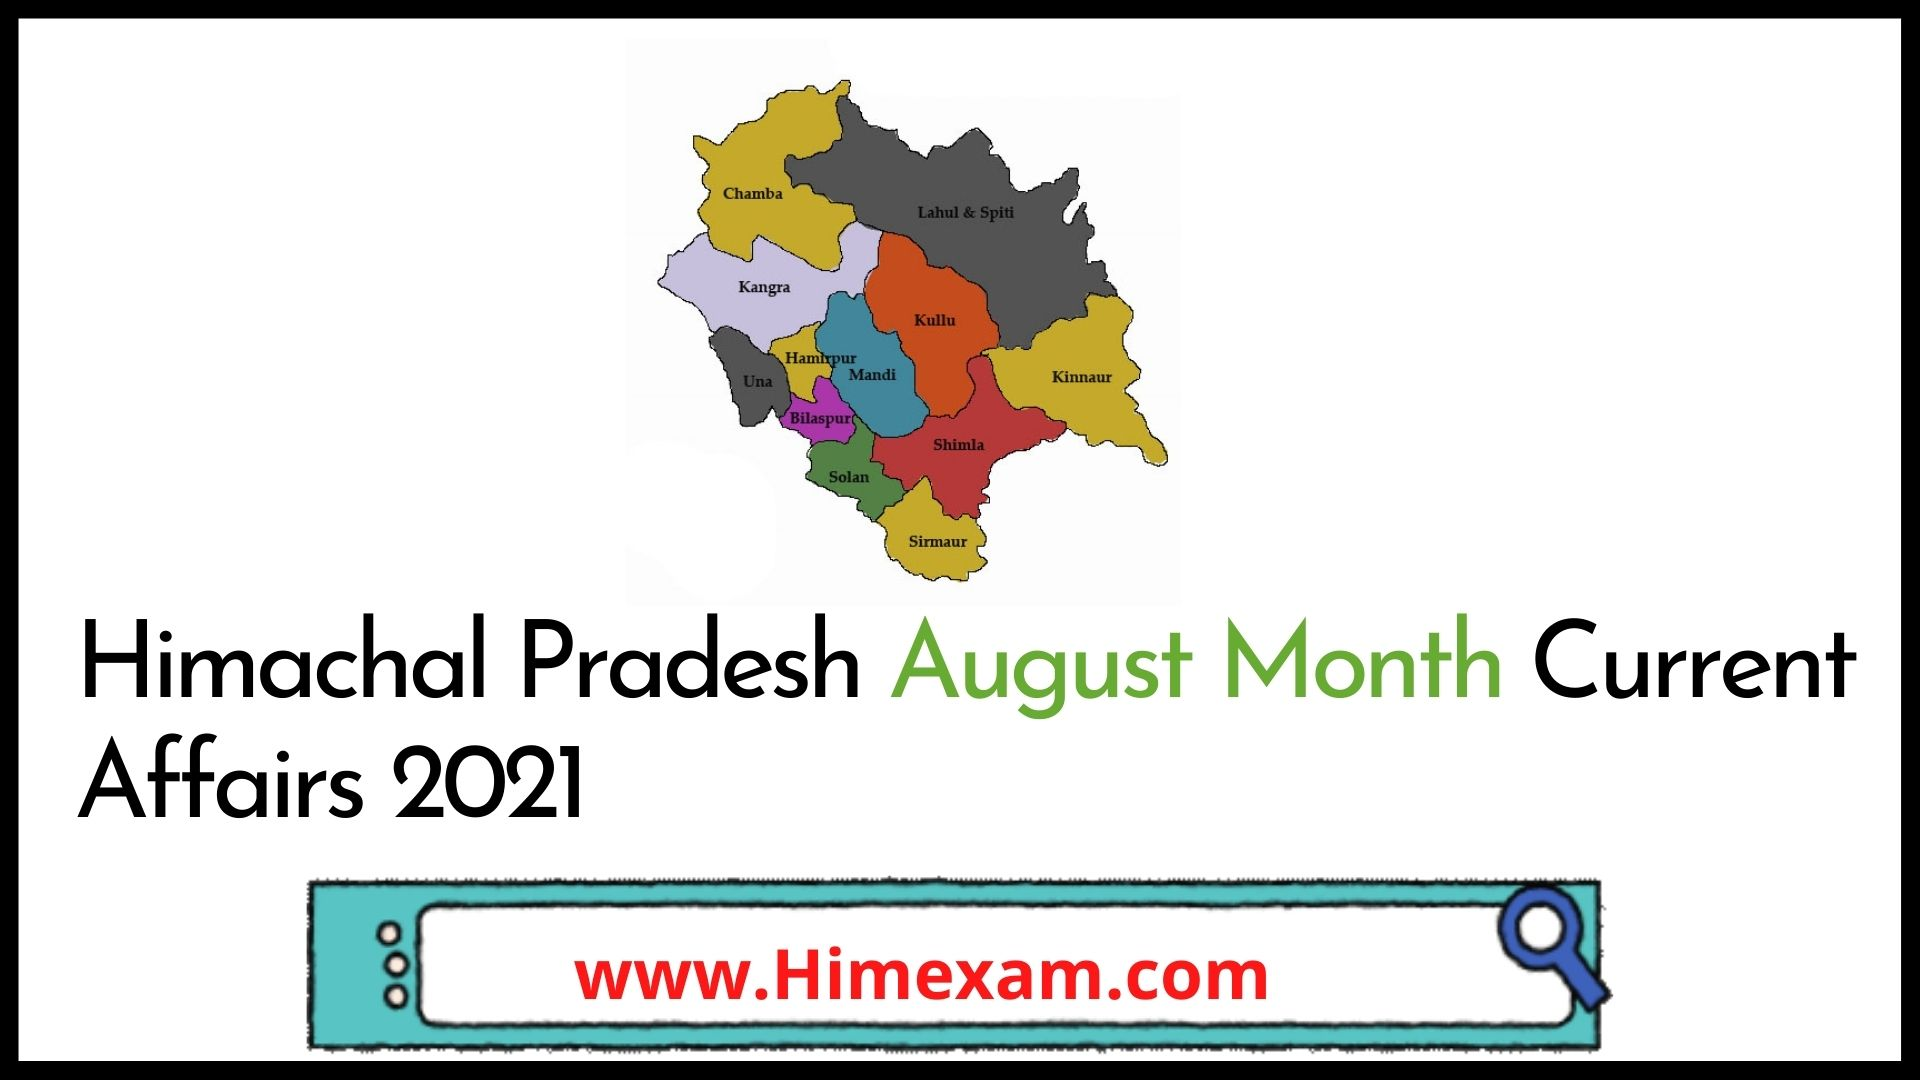 Himachal Pradesh August Month Current Affairs 2021